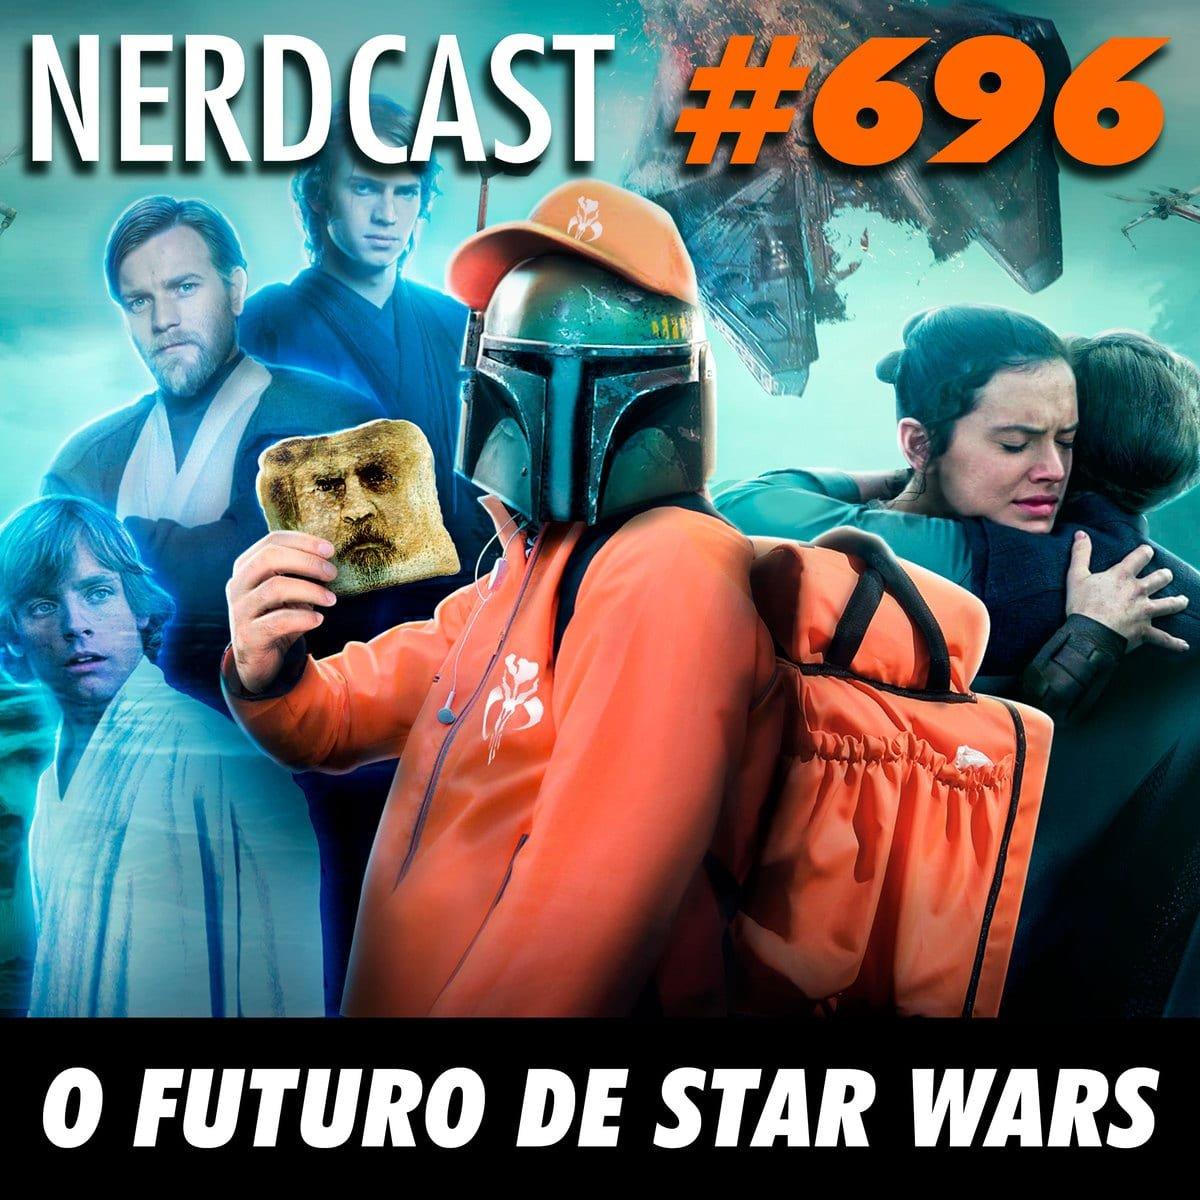 NerdCast 696 - O futuro de Star Wars